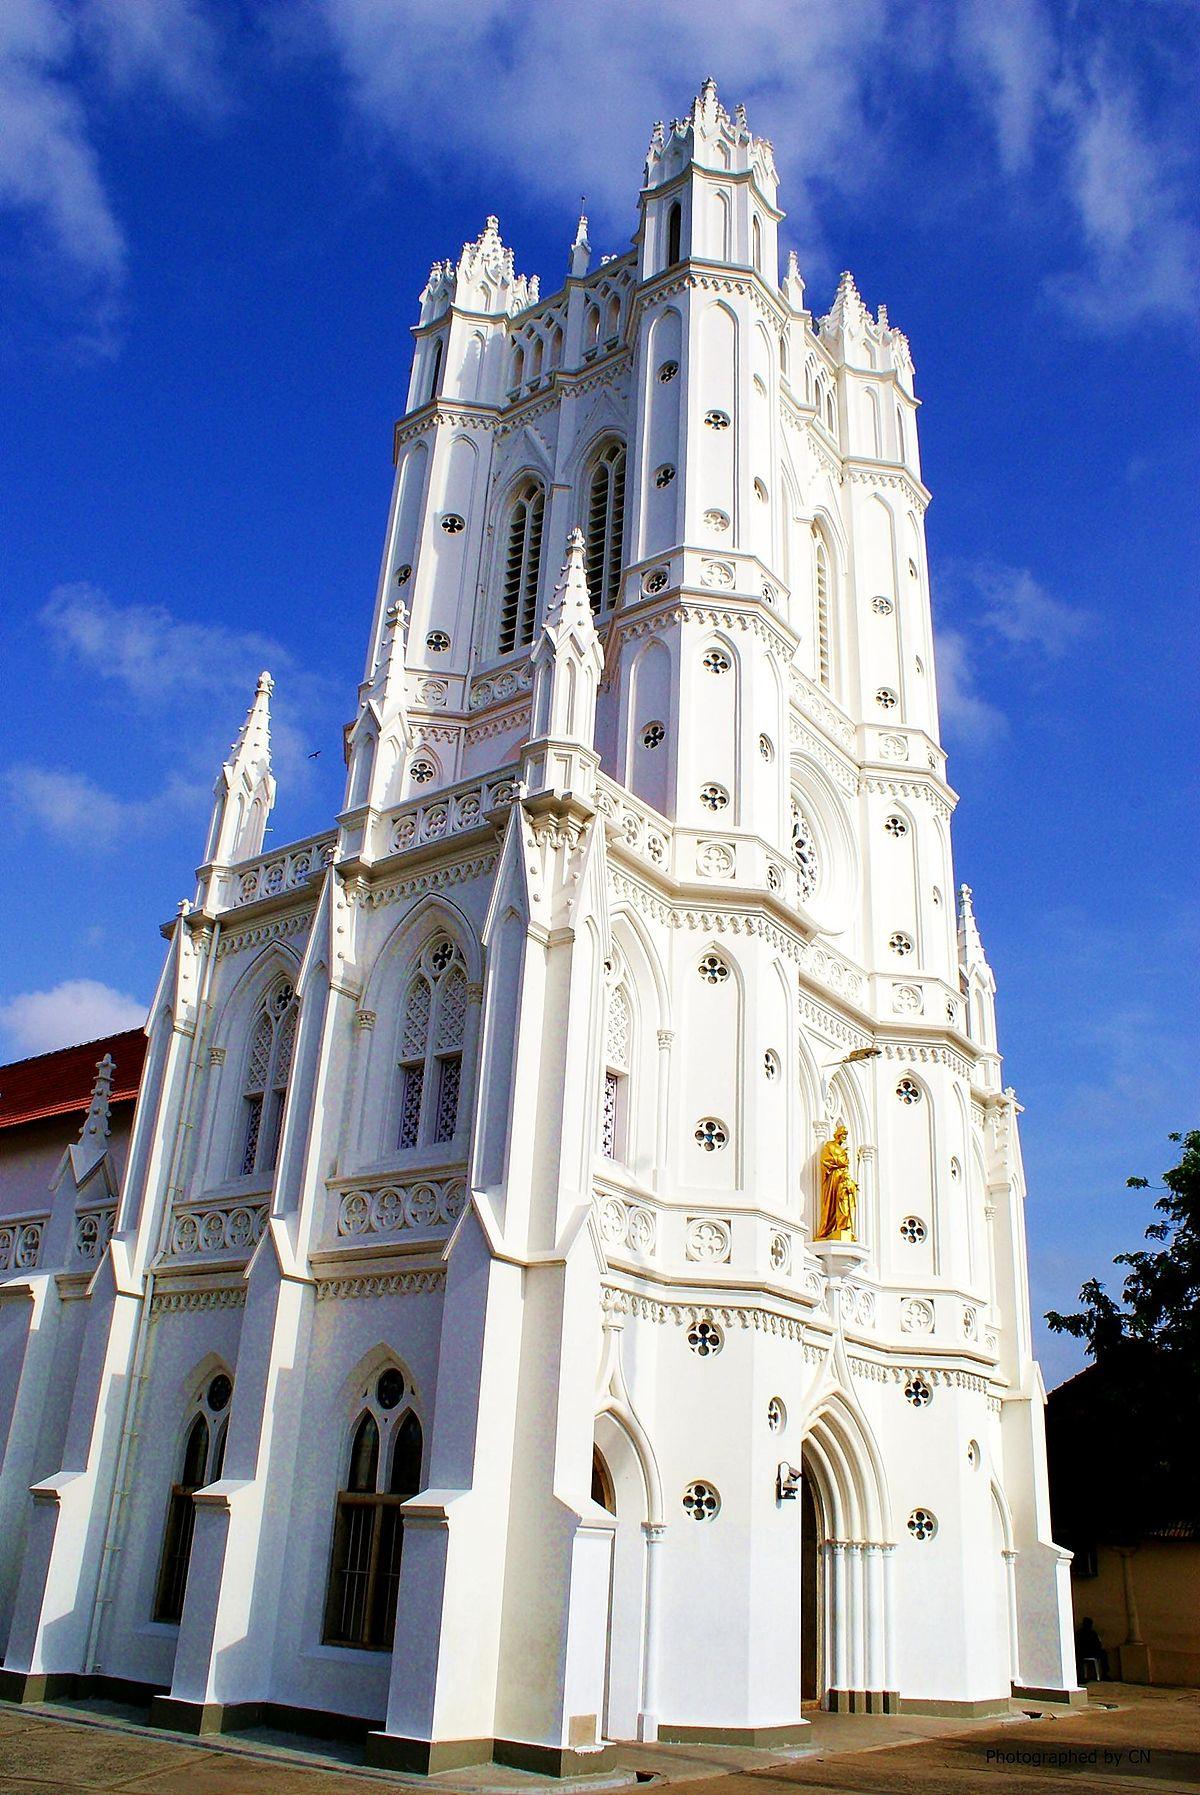 St. Joseph's Cathedral, Trivandrum - Wikipedia